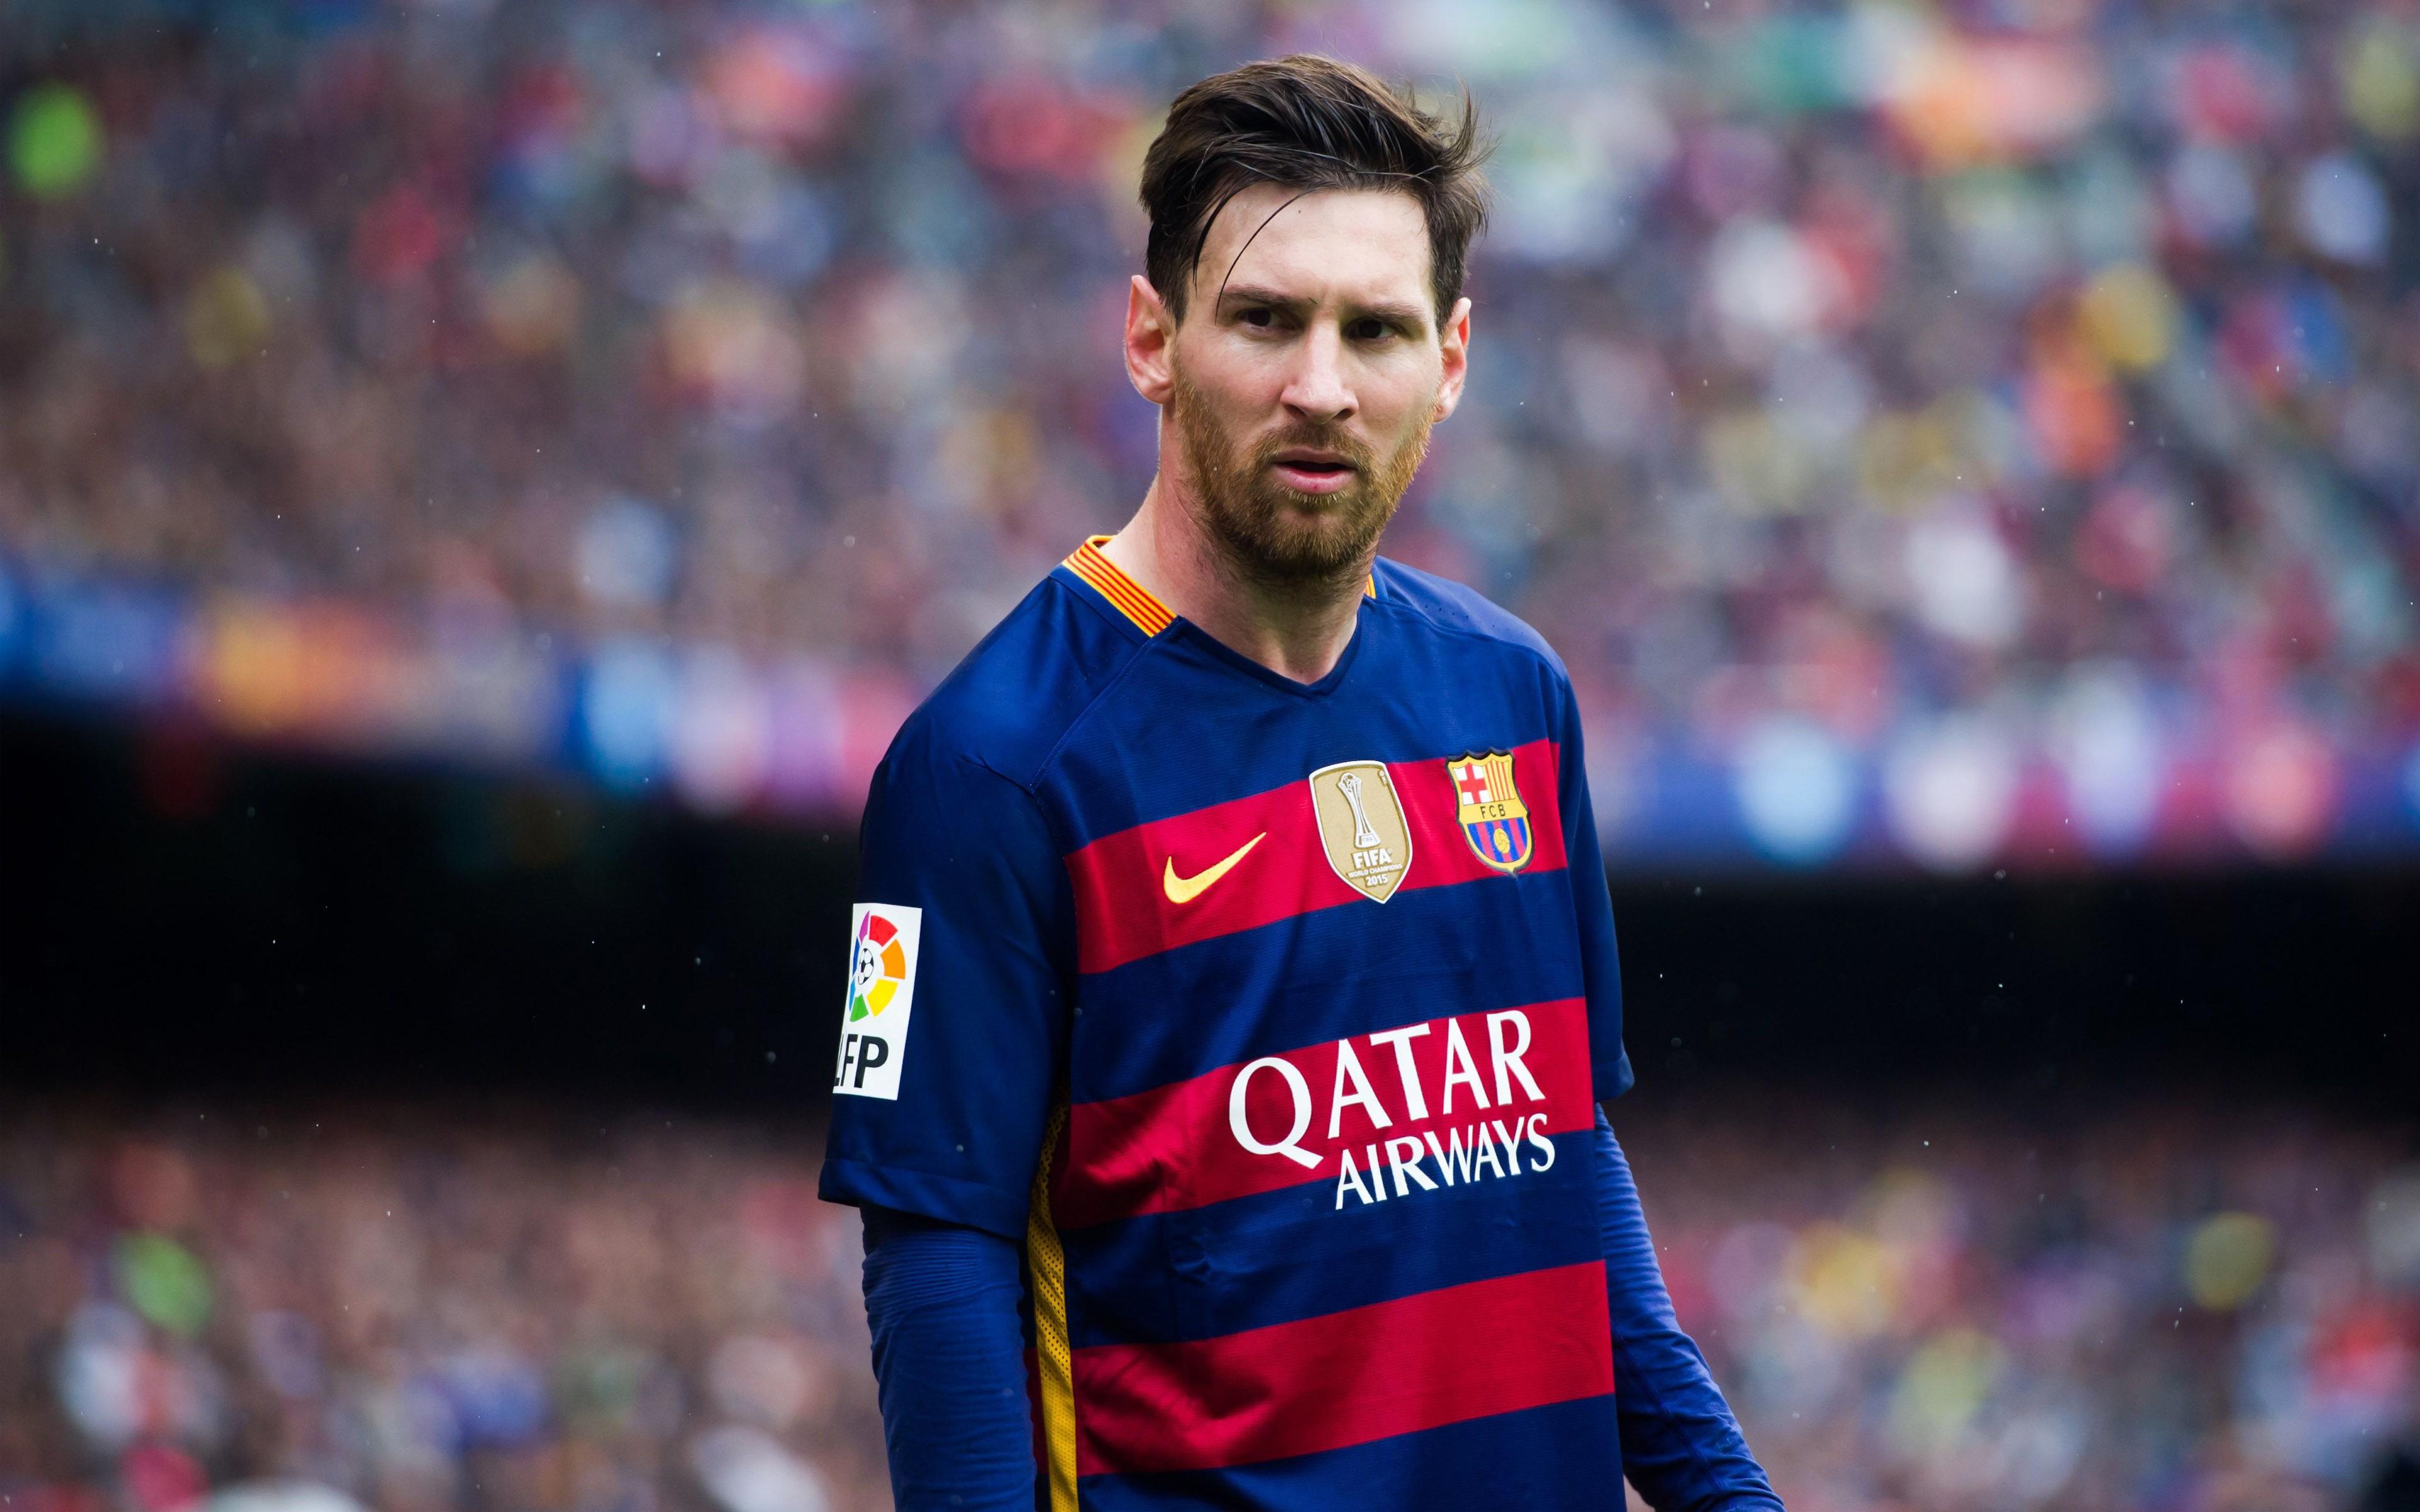 Fc Barcelona Wallpaper Iphone X Lionel Messi Fc Barcelona 4k Wallpapers Hd Wallpapers